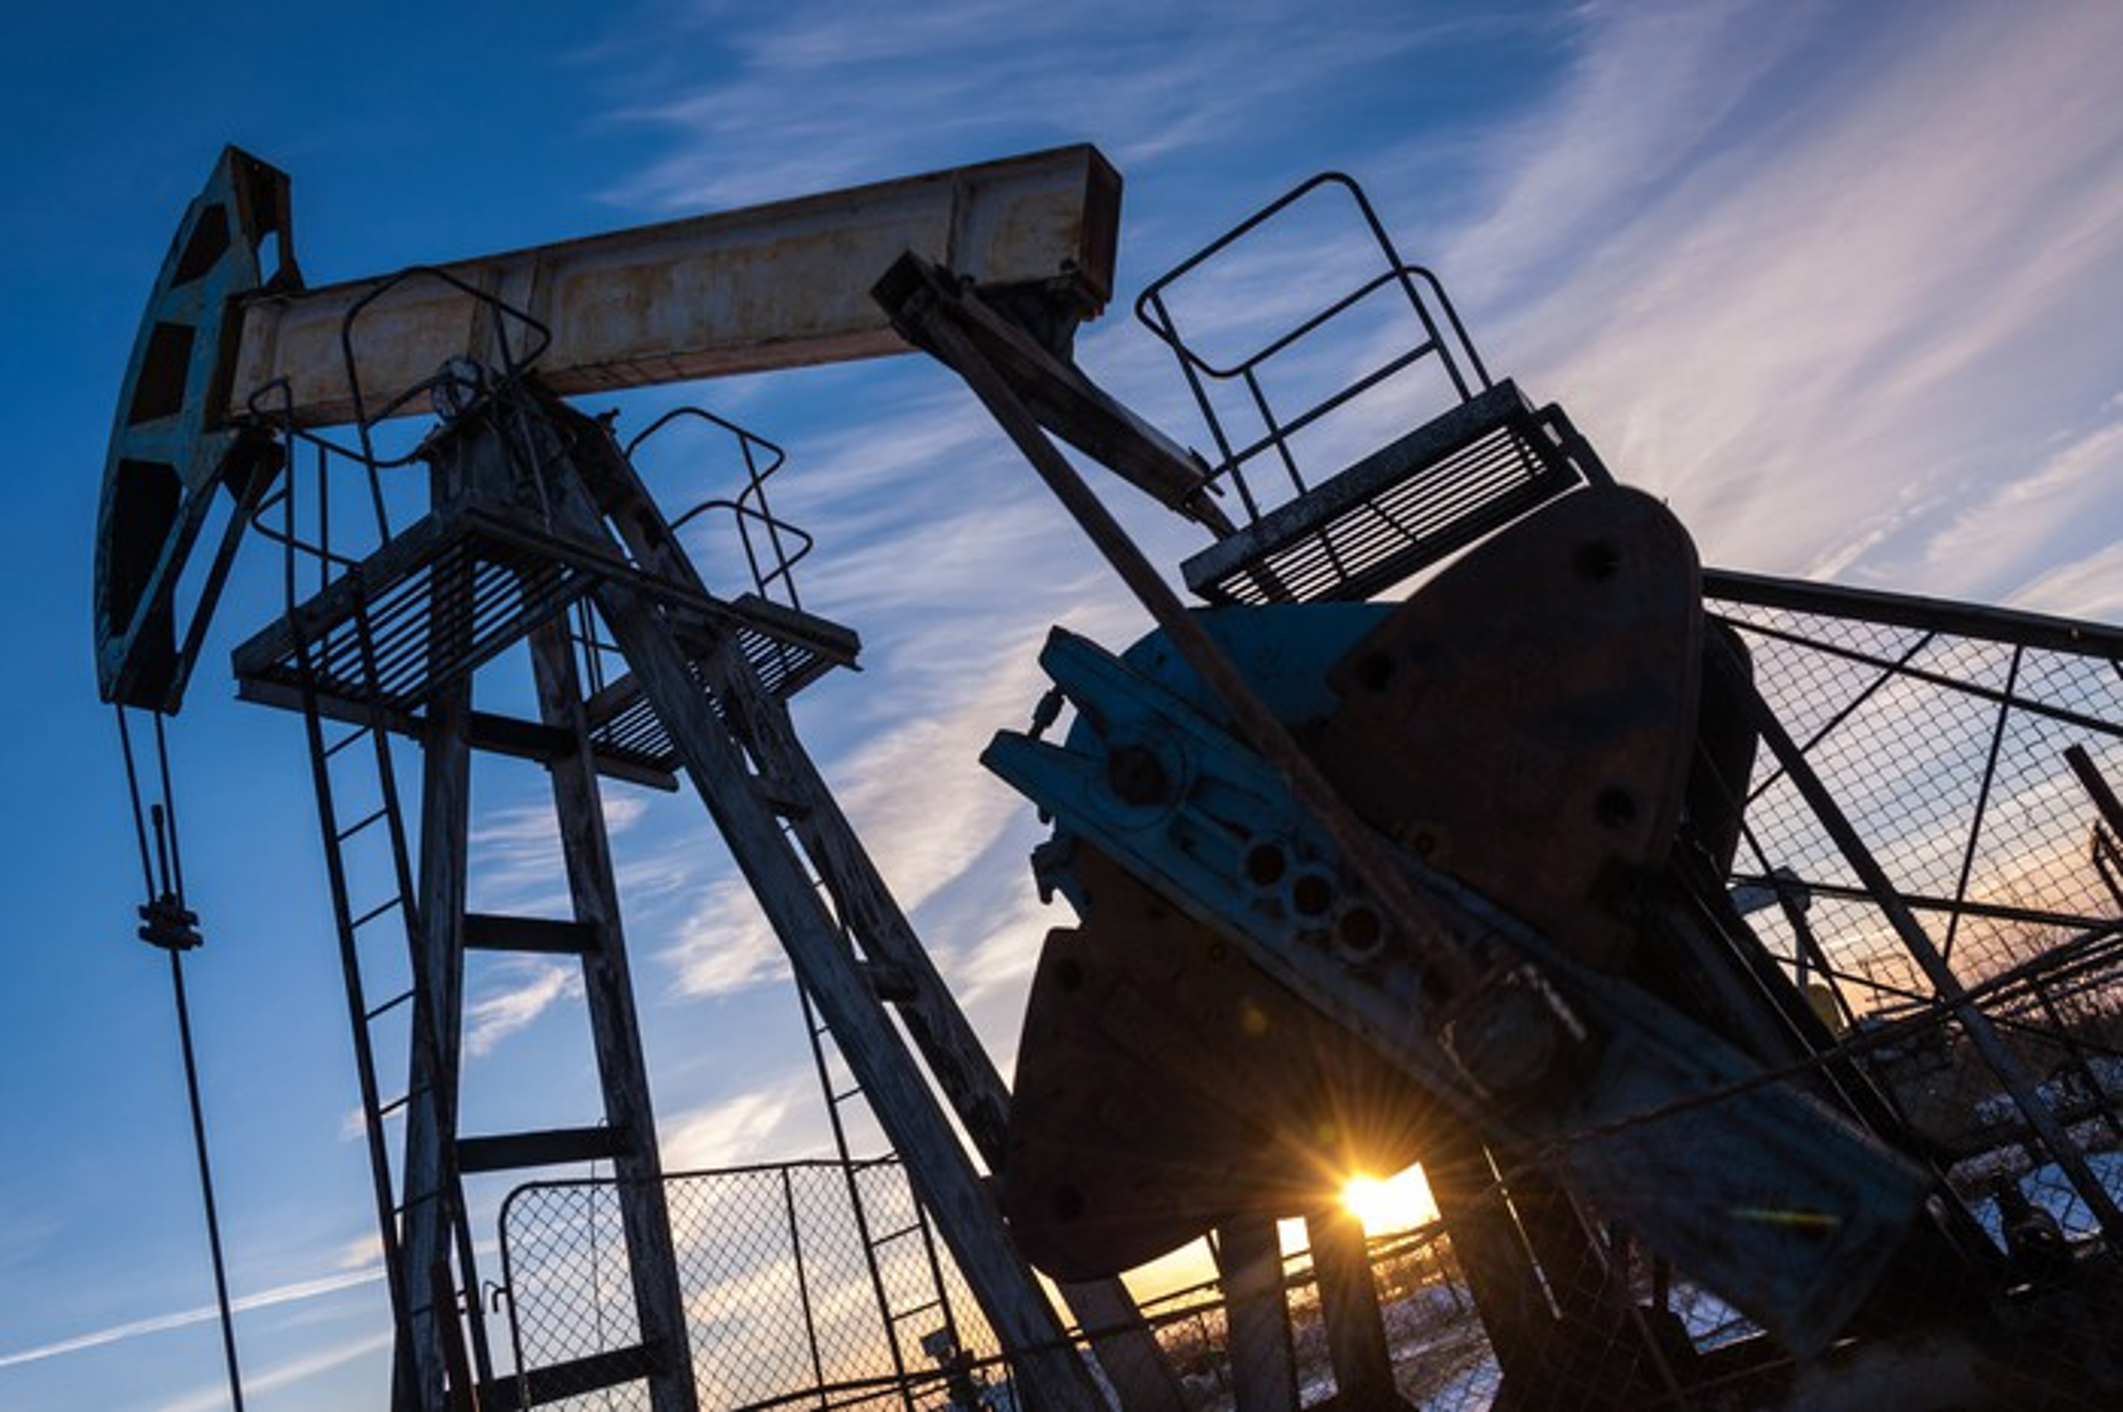 An oil pump with the sun shining through.